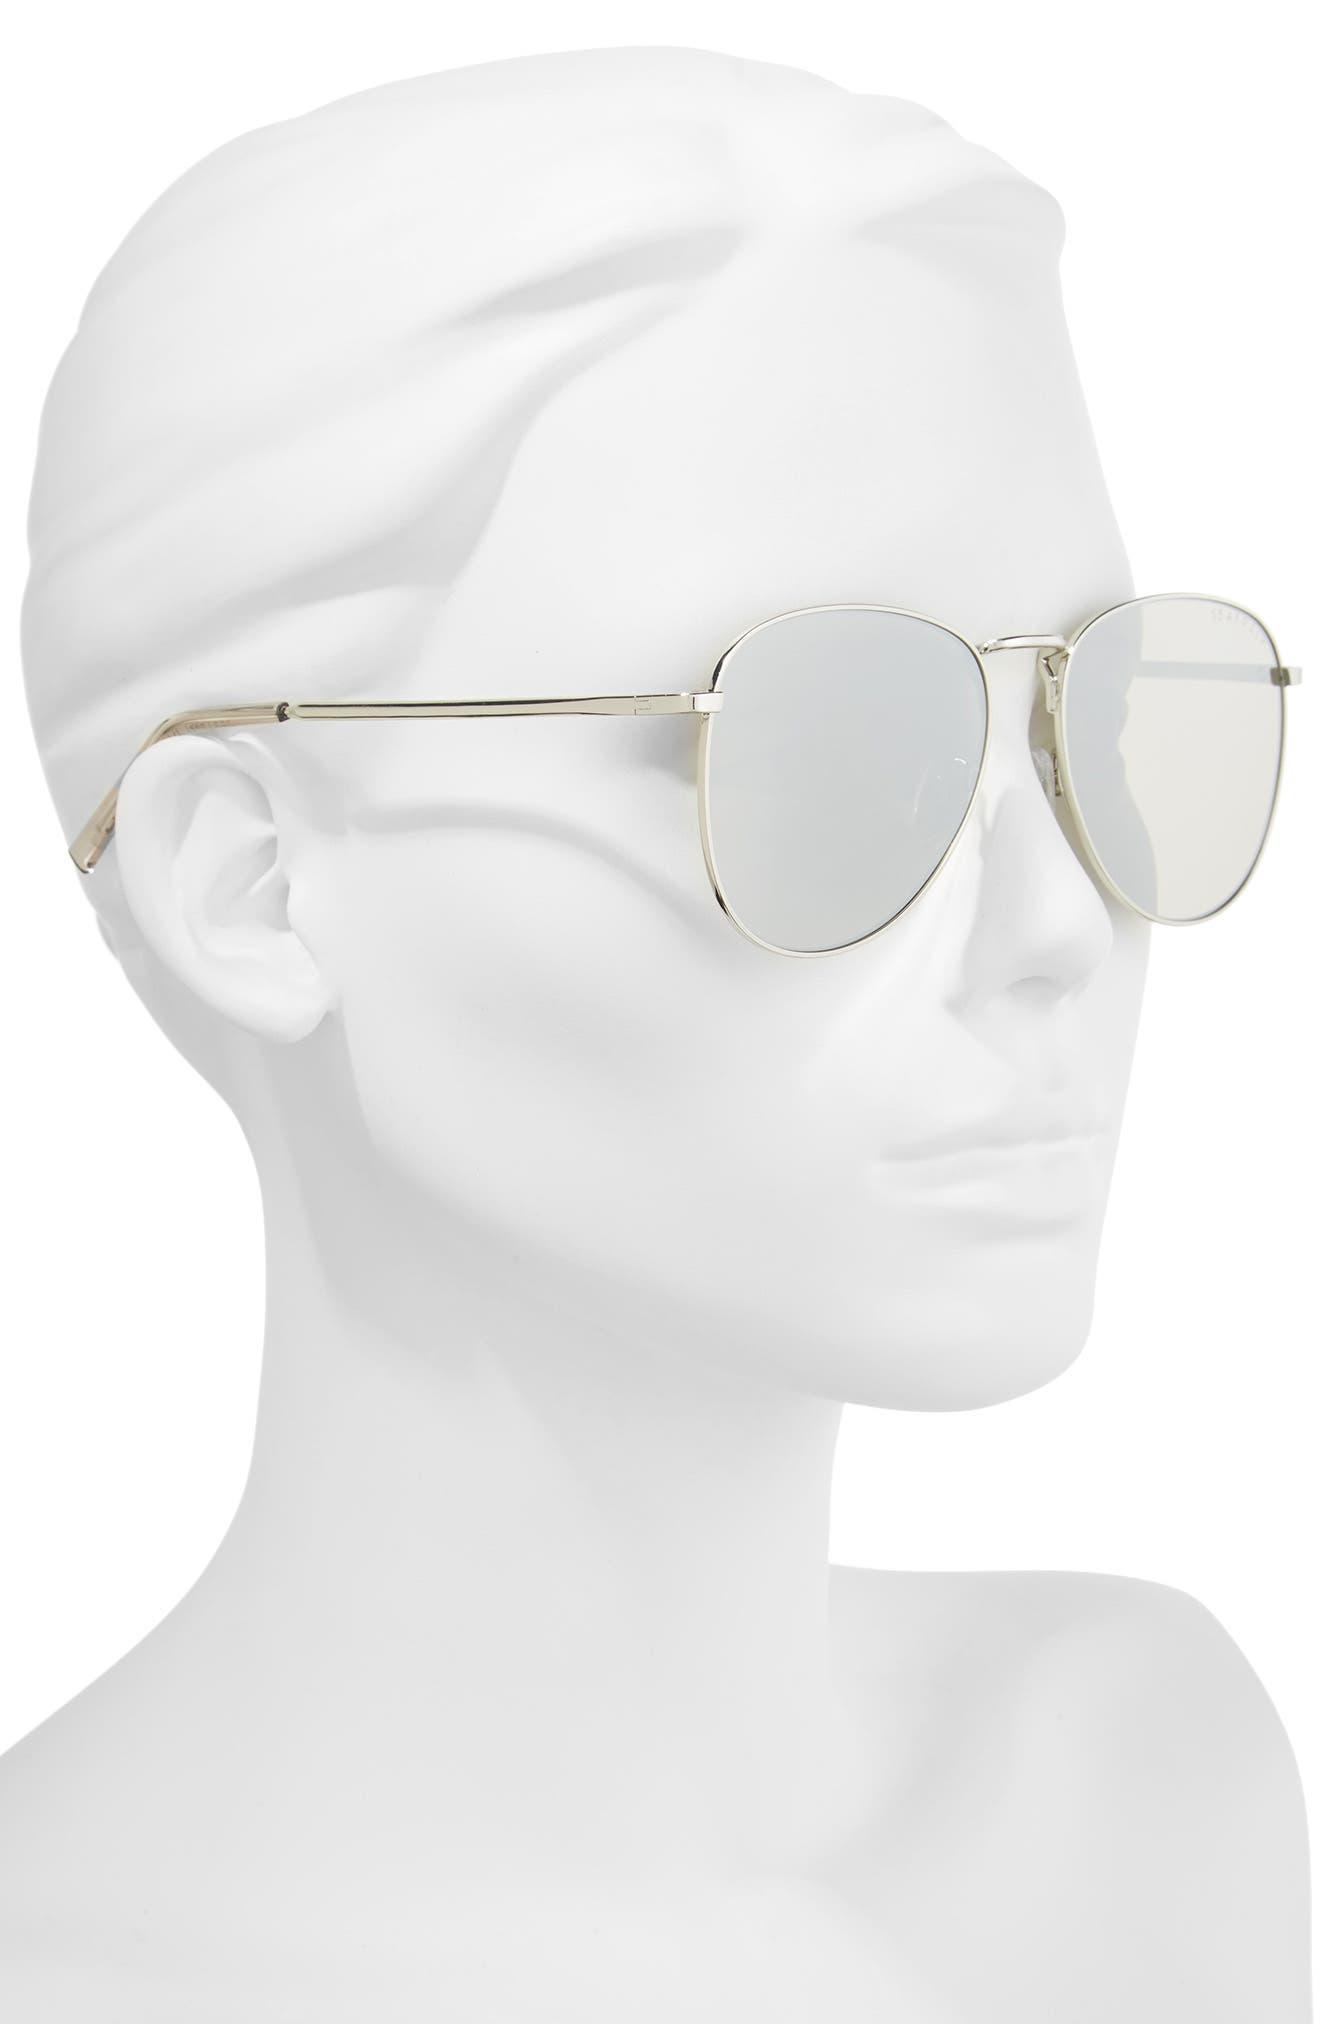 Clovelly 56mm Metal Sunglasses,                             Alternate thumbnail 2, color,                             Sand